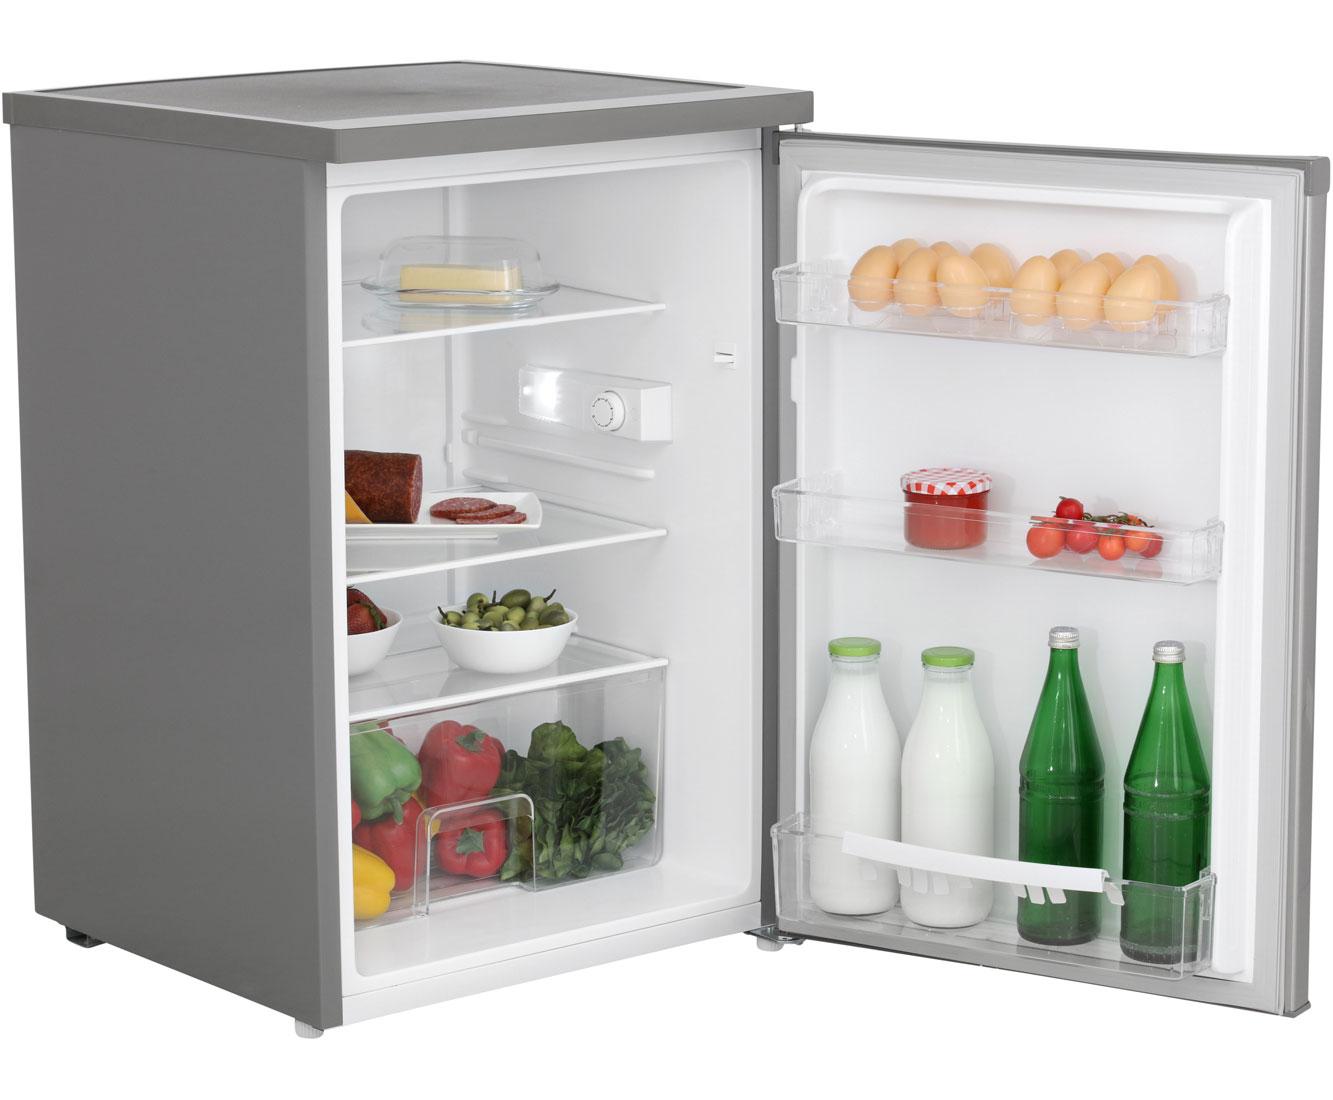 Bomann Mini Kühlschrank Jägermeister : K hlschrank welche stufe analyse laborgeräte kühlschränke